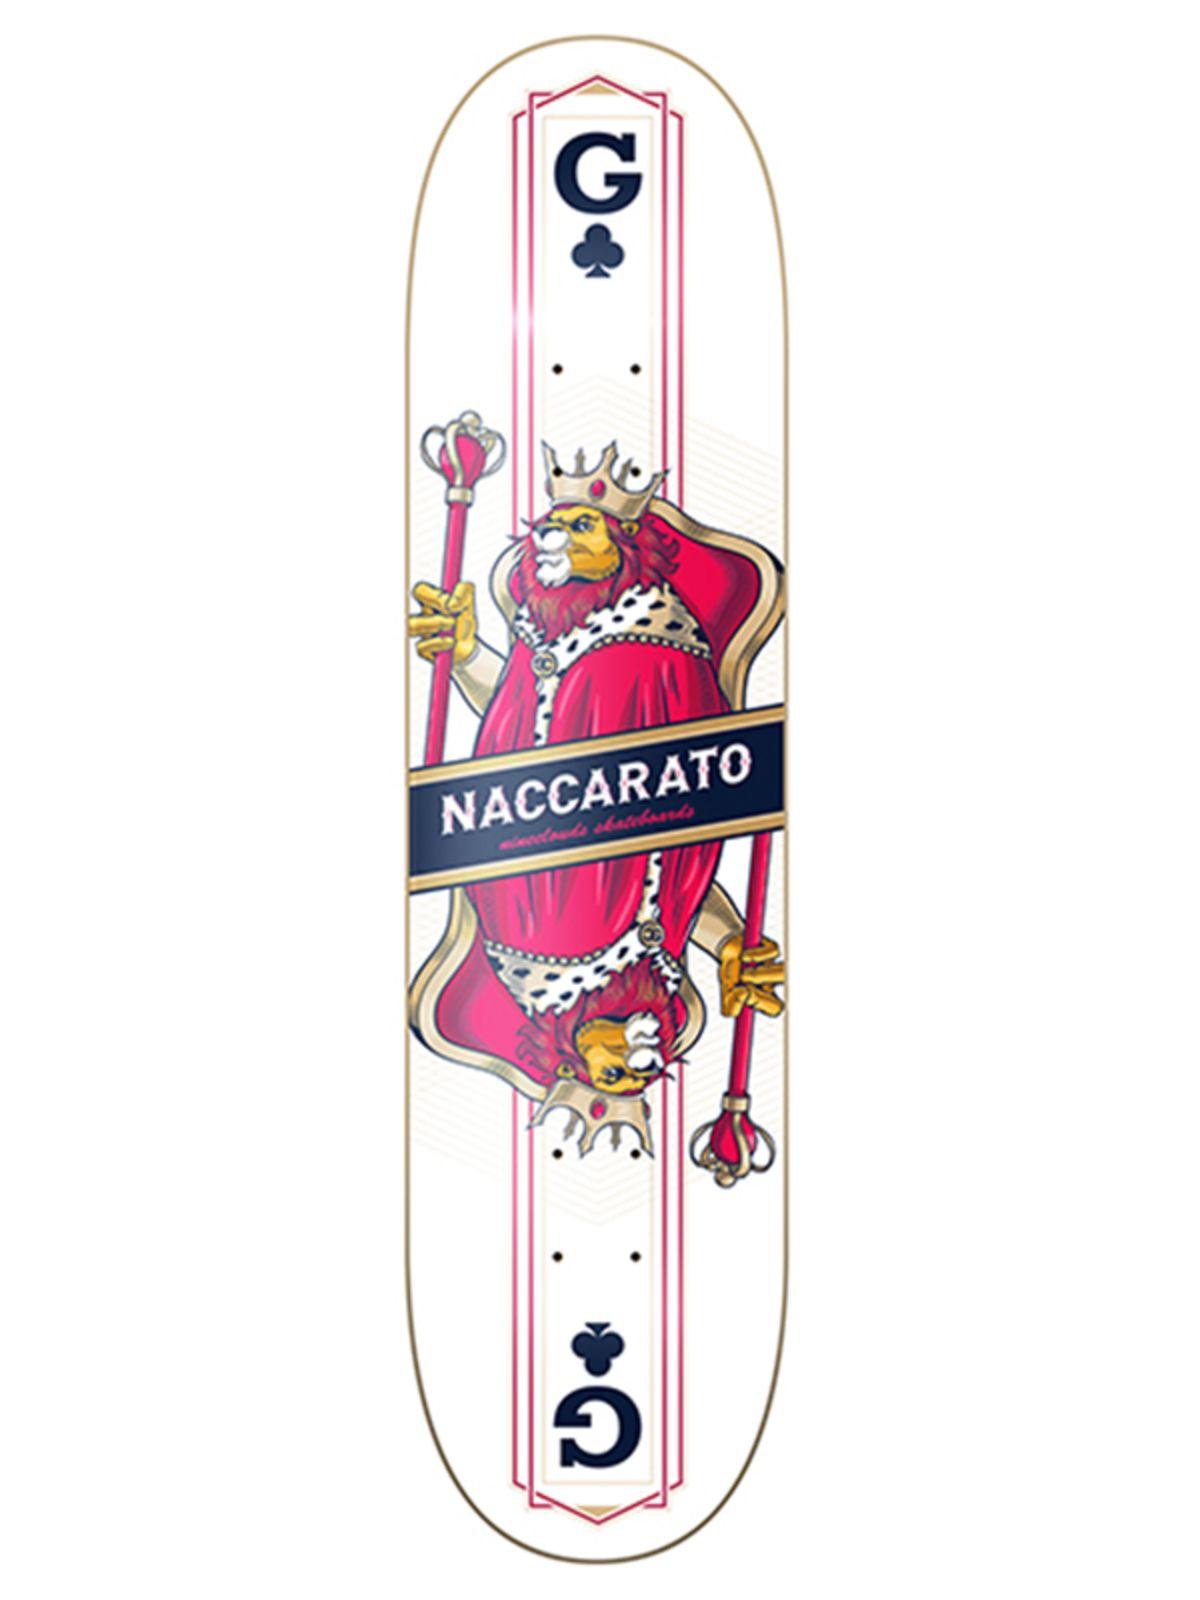 shape-nineclouds-promodel-gian-naccarato-cards-rani-787-1-image